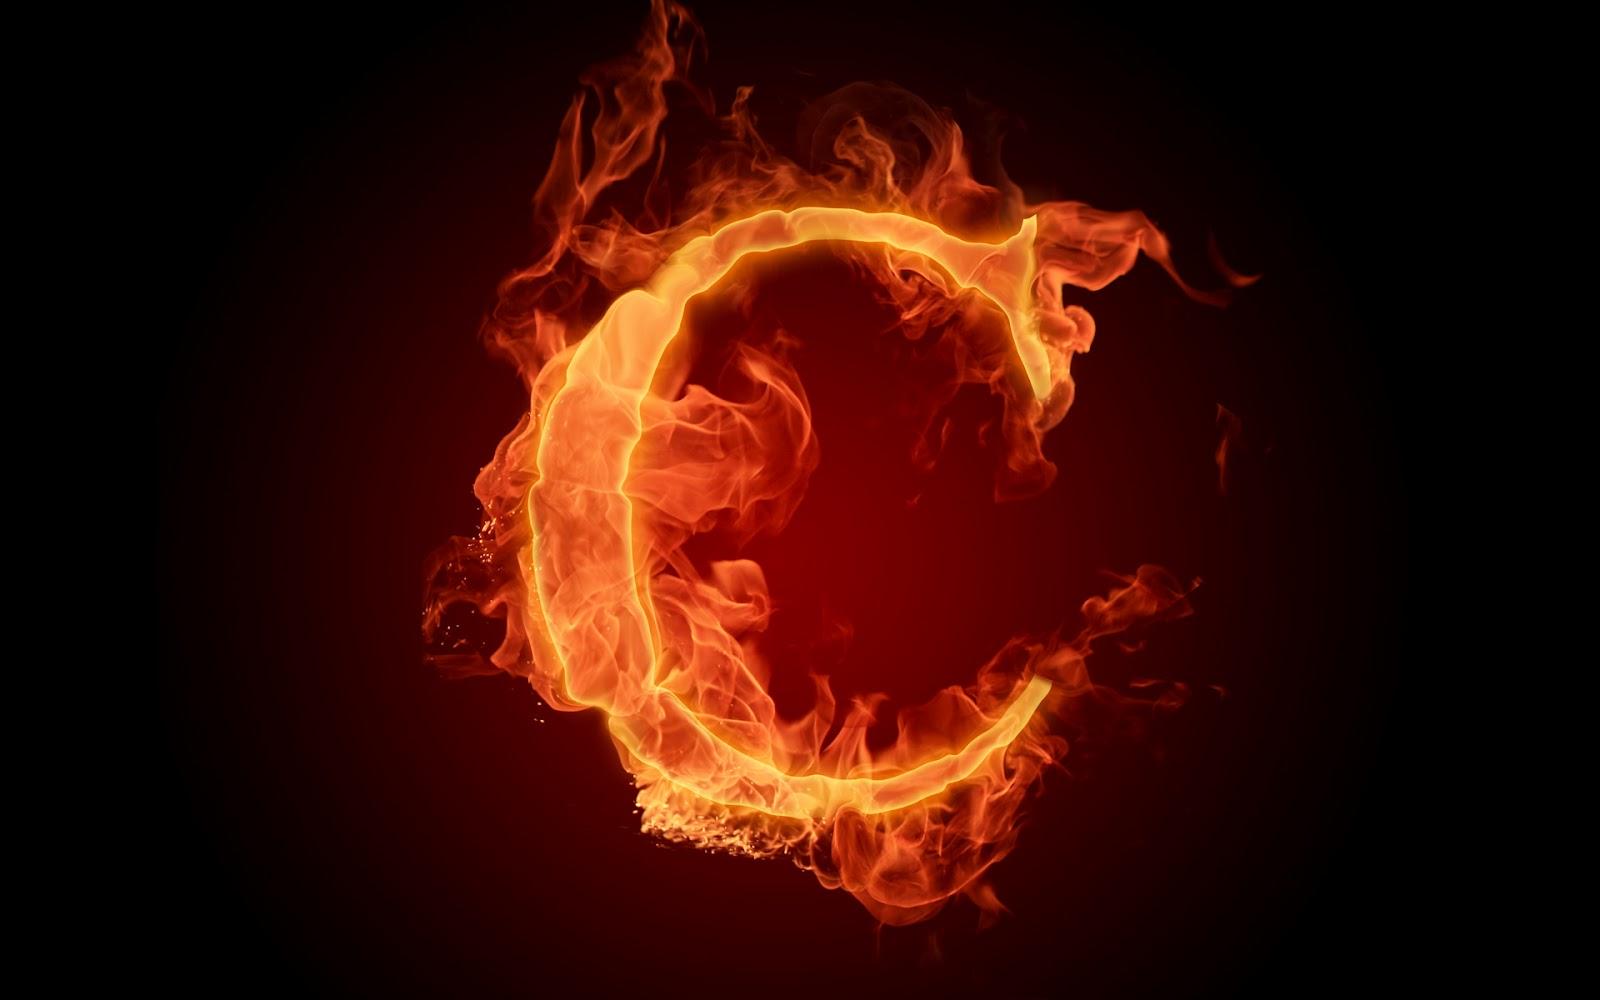 http://4.bp.blogspot.com/-9Axq2ZiSJc4/T0jWWkJQSVI/AAAAAAAAM6I/JrVrLK_FhJU/s1600/the-fiery-english-alphabet-picture-c_1920x1200_73617.jpg